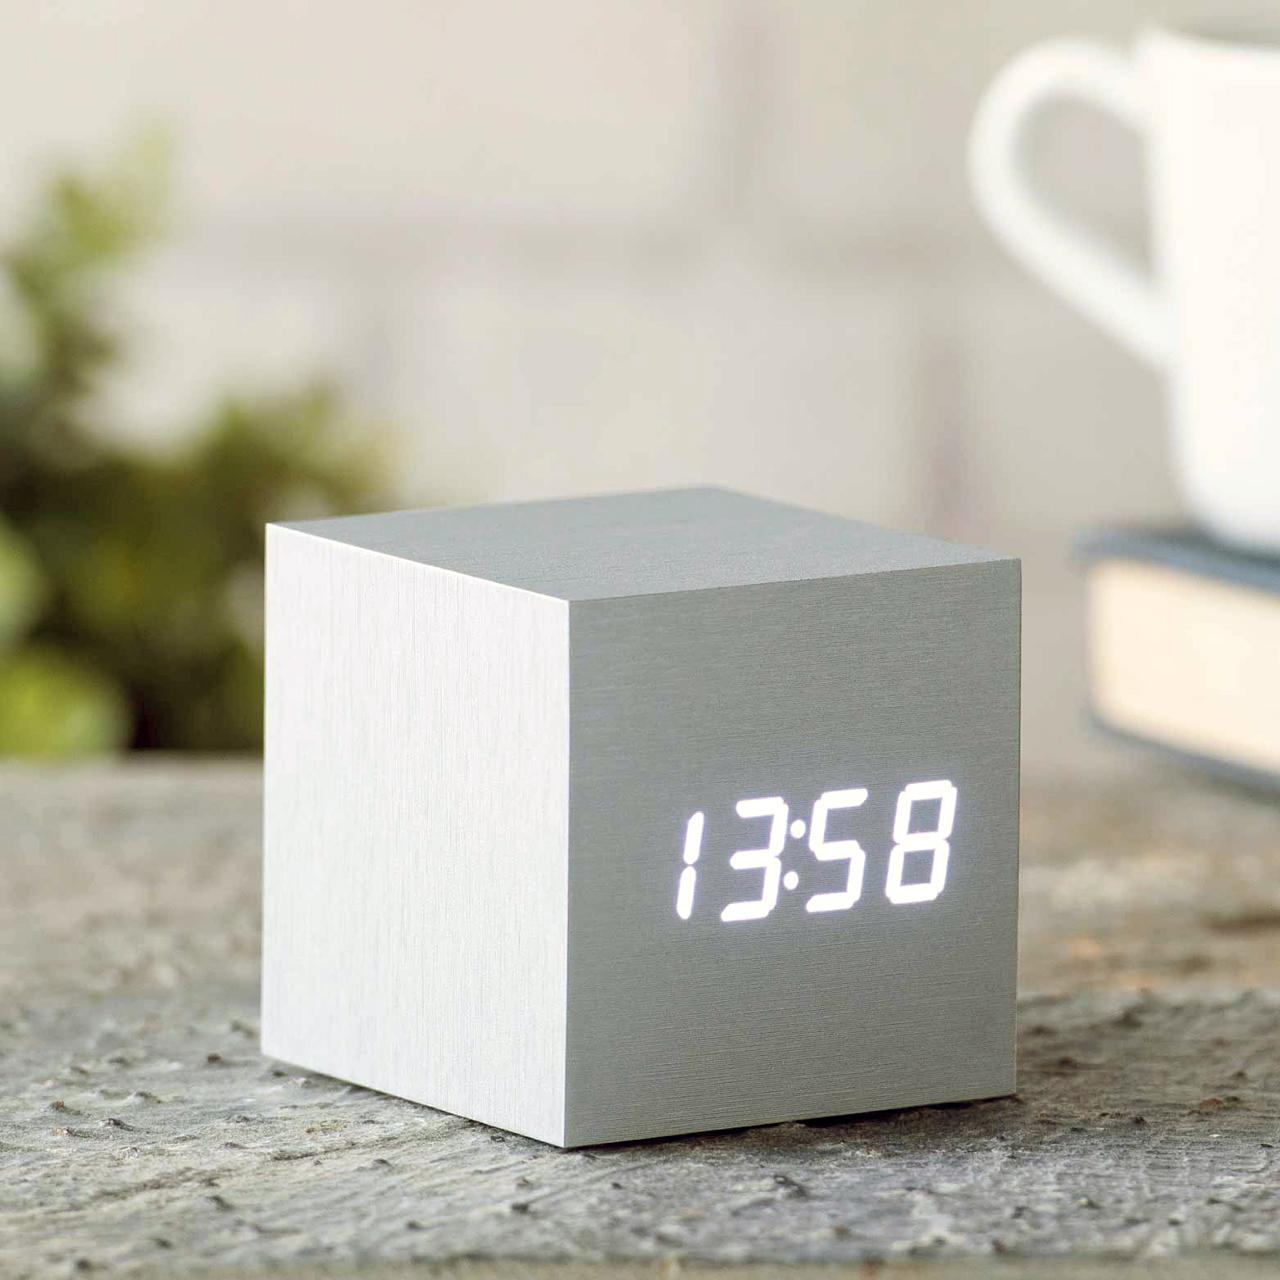 GINGKO cube click clock white / white LED | the design gift shop